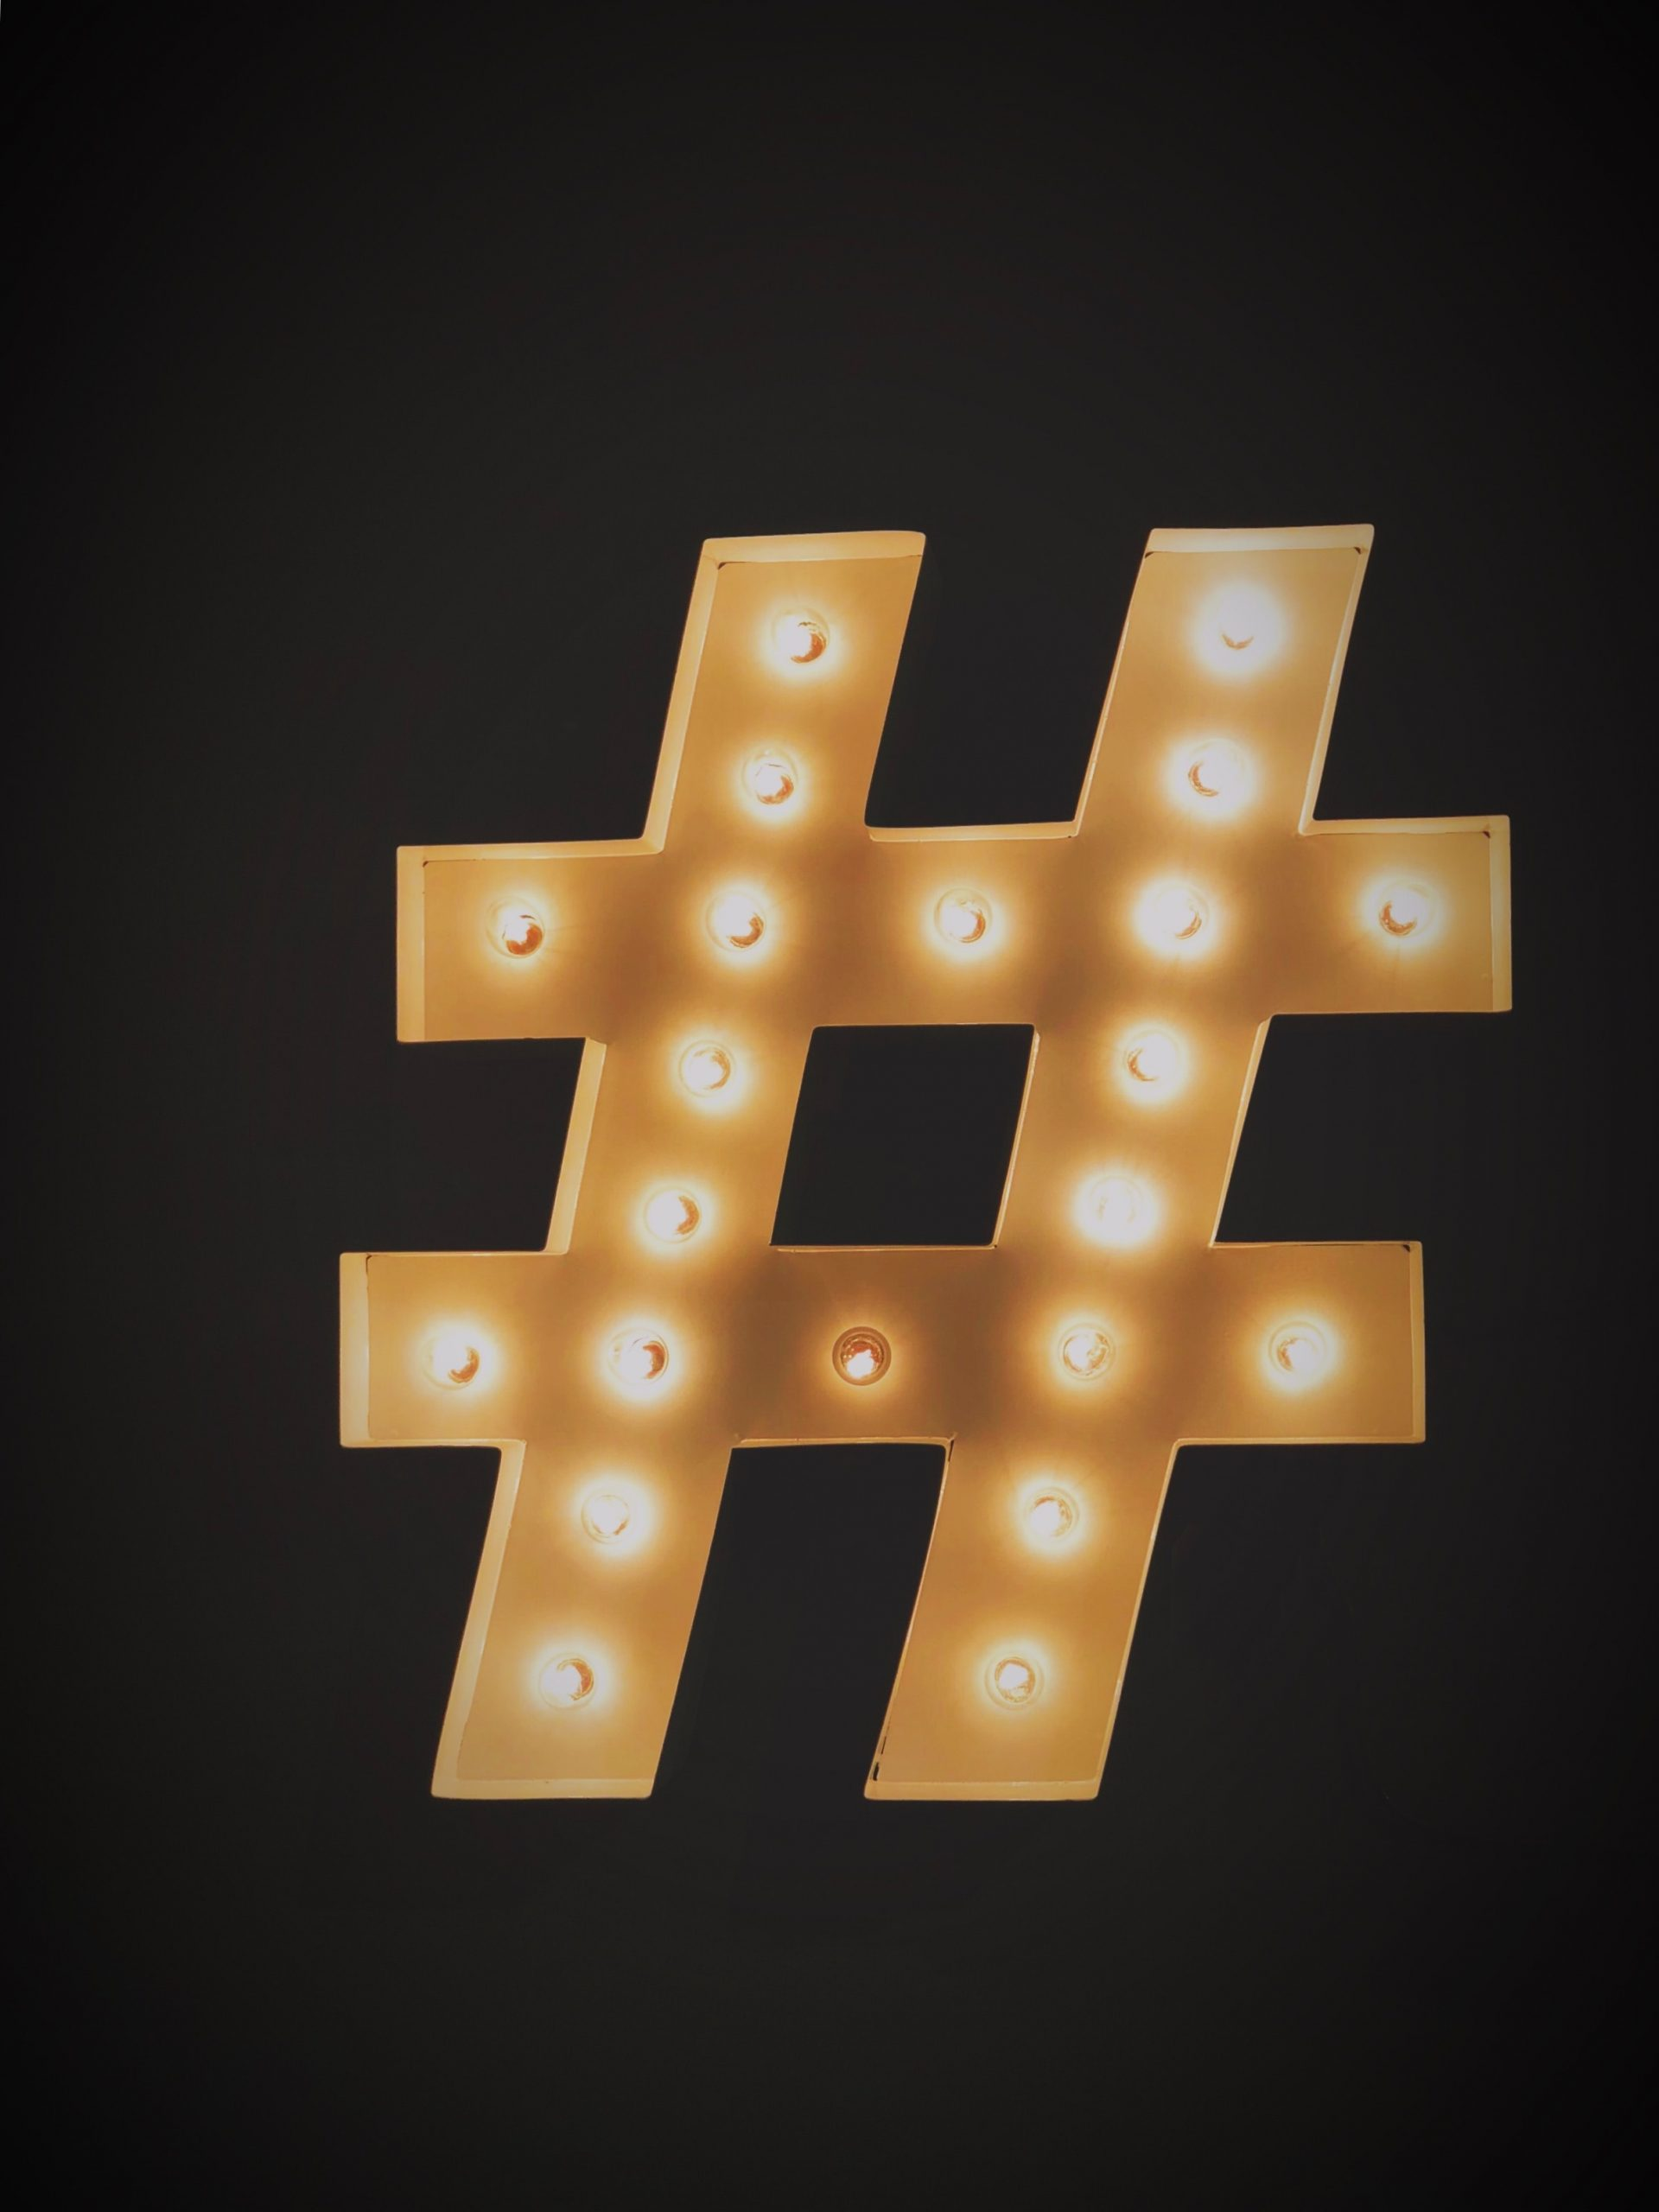 social media hash tag